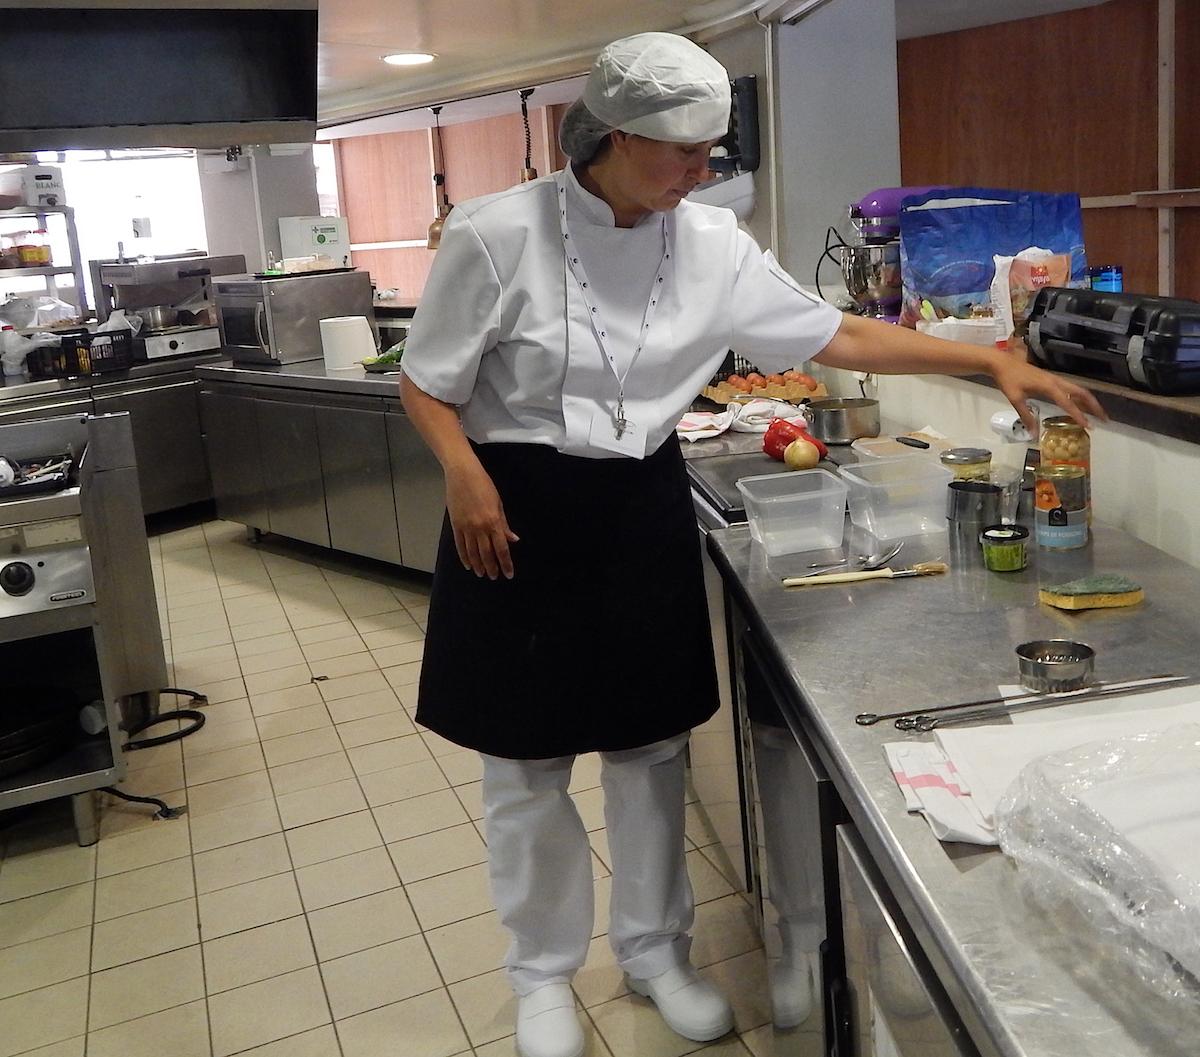 Porto-Vecchio : Marie-Béatrice Corbina et Marie Valadier, Top cheffes !